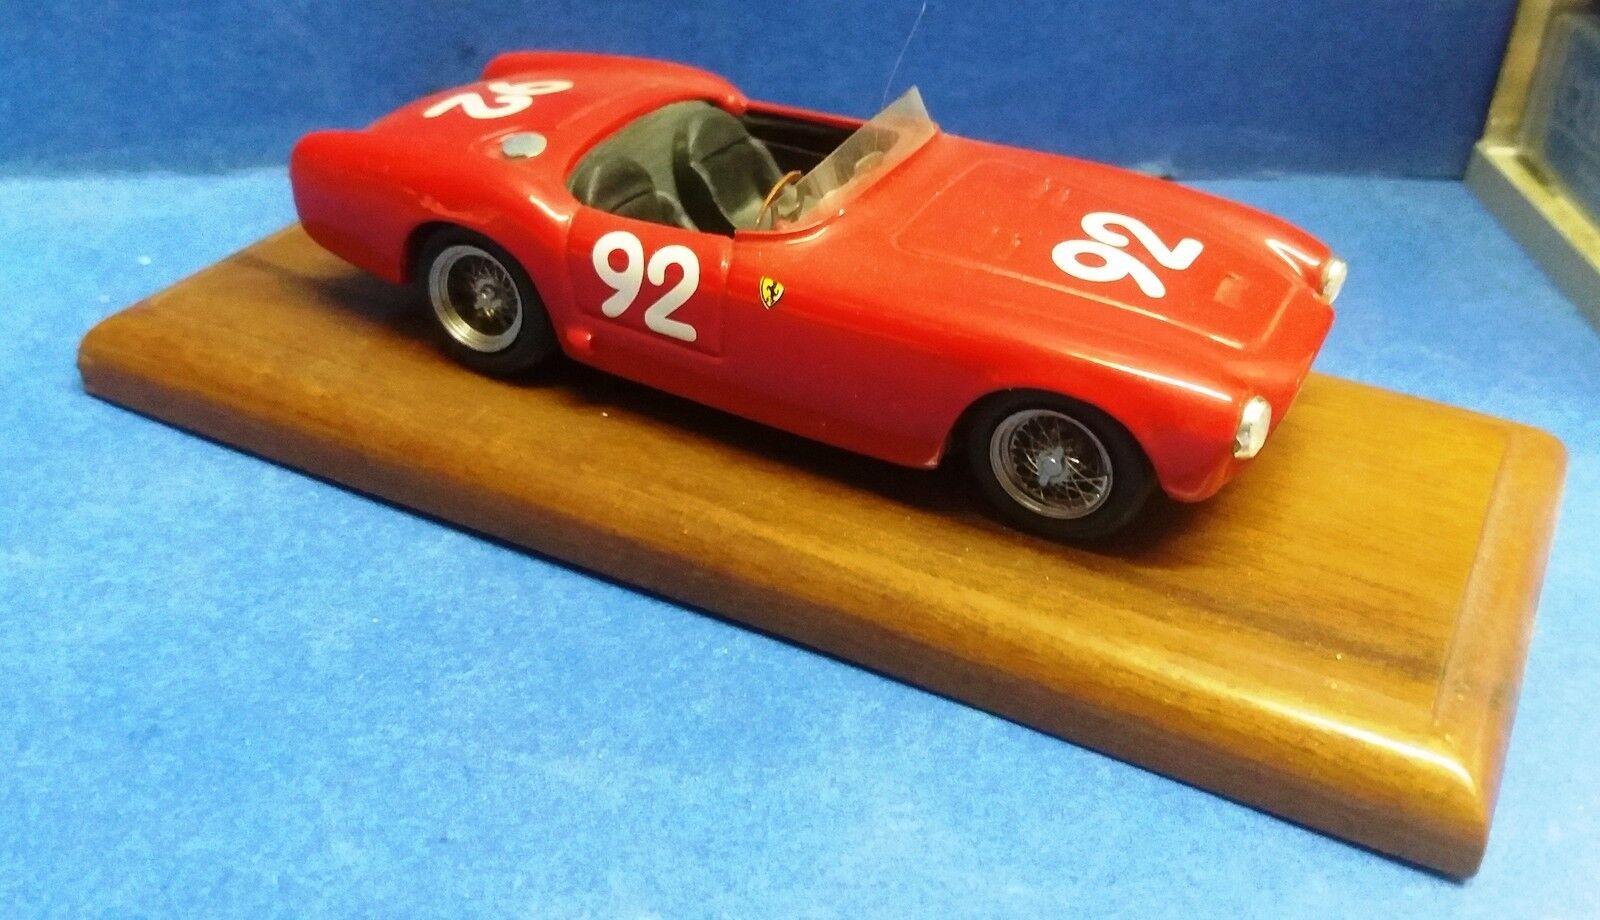 52462 Modellismo 1/43 in resina - Ferrari 225 S Spyder Vignale